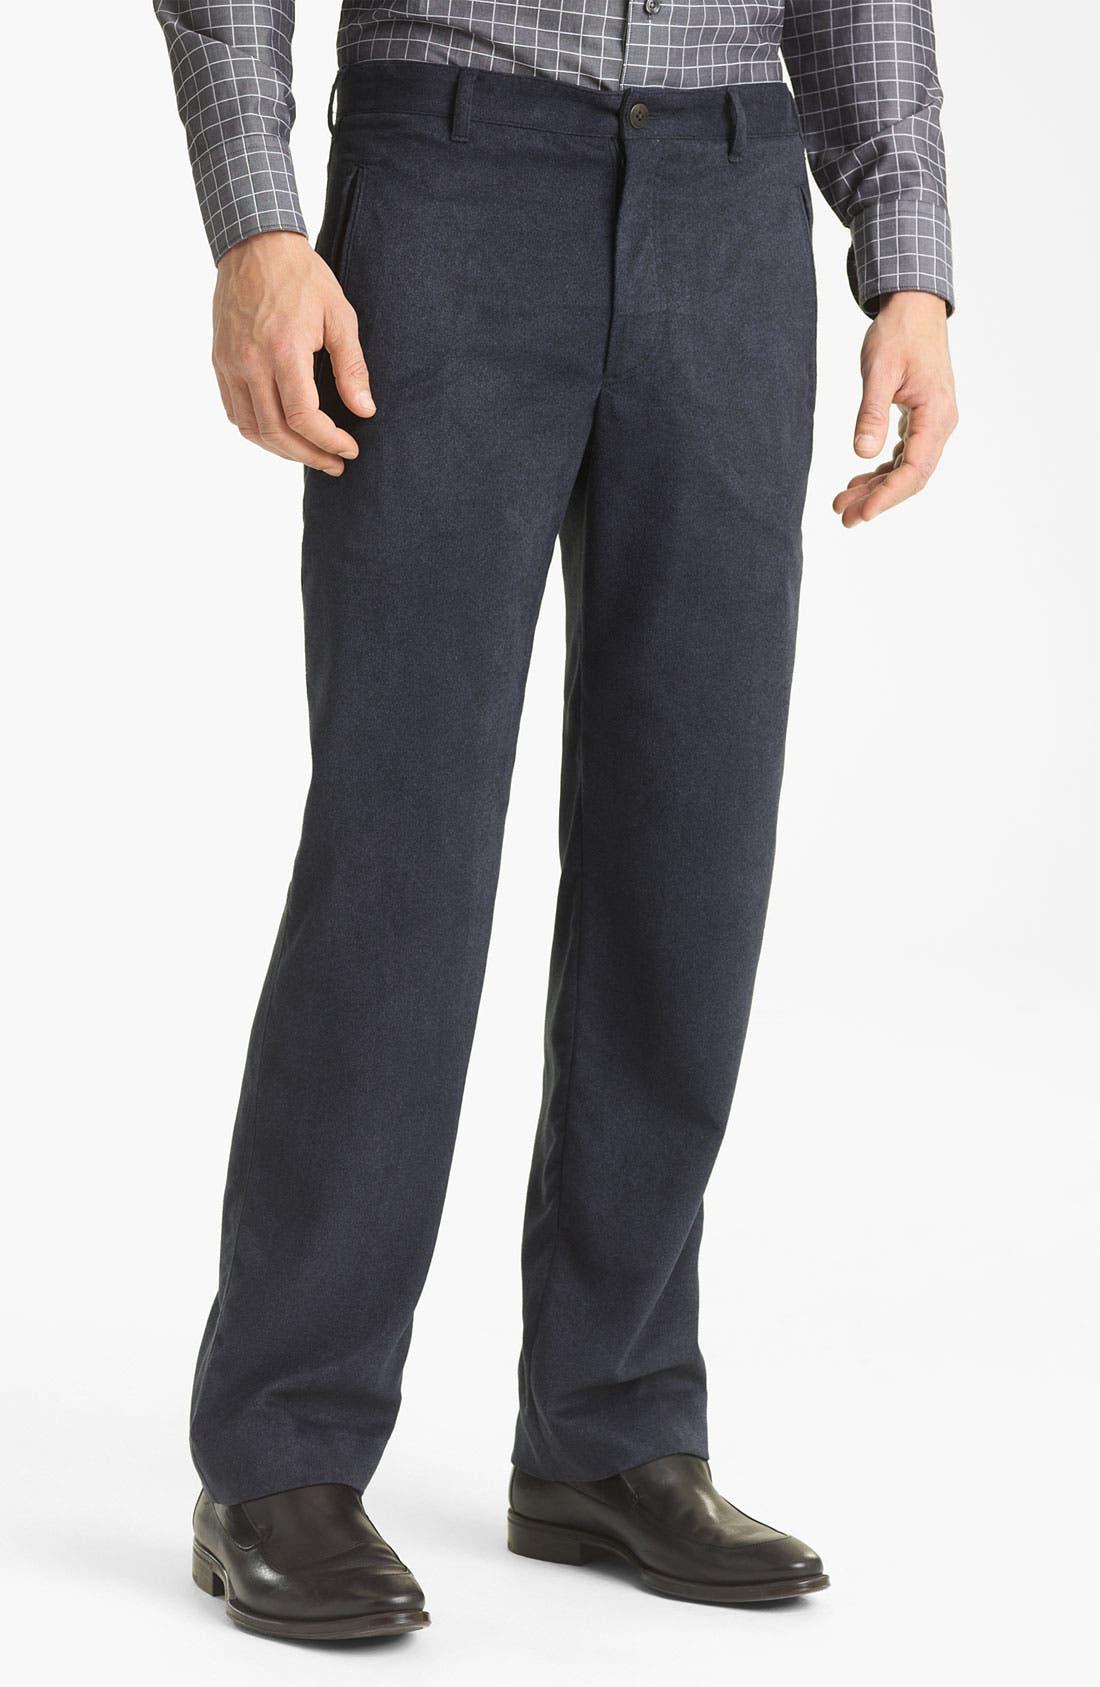 Alternate Image 1 Selected - Armani Collezioni Dress Pants